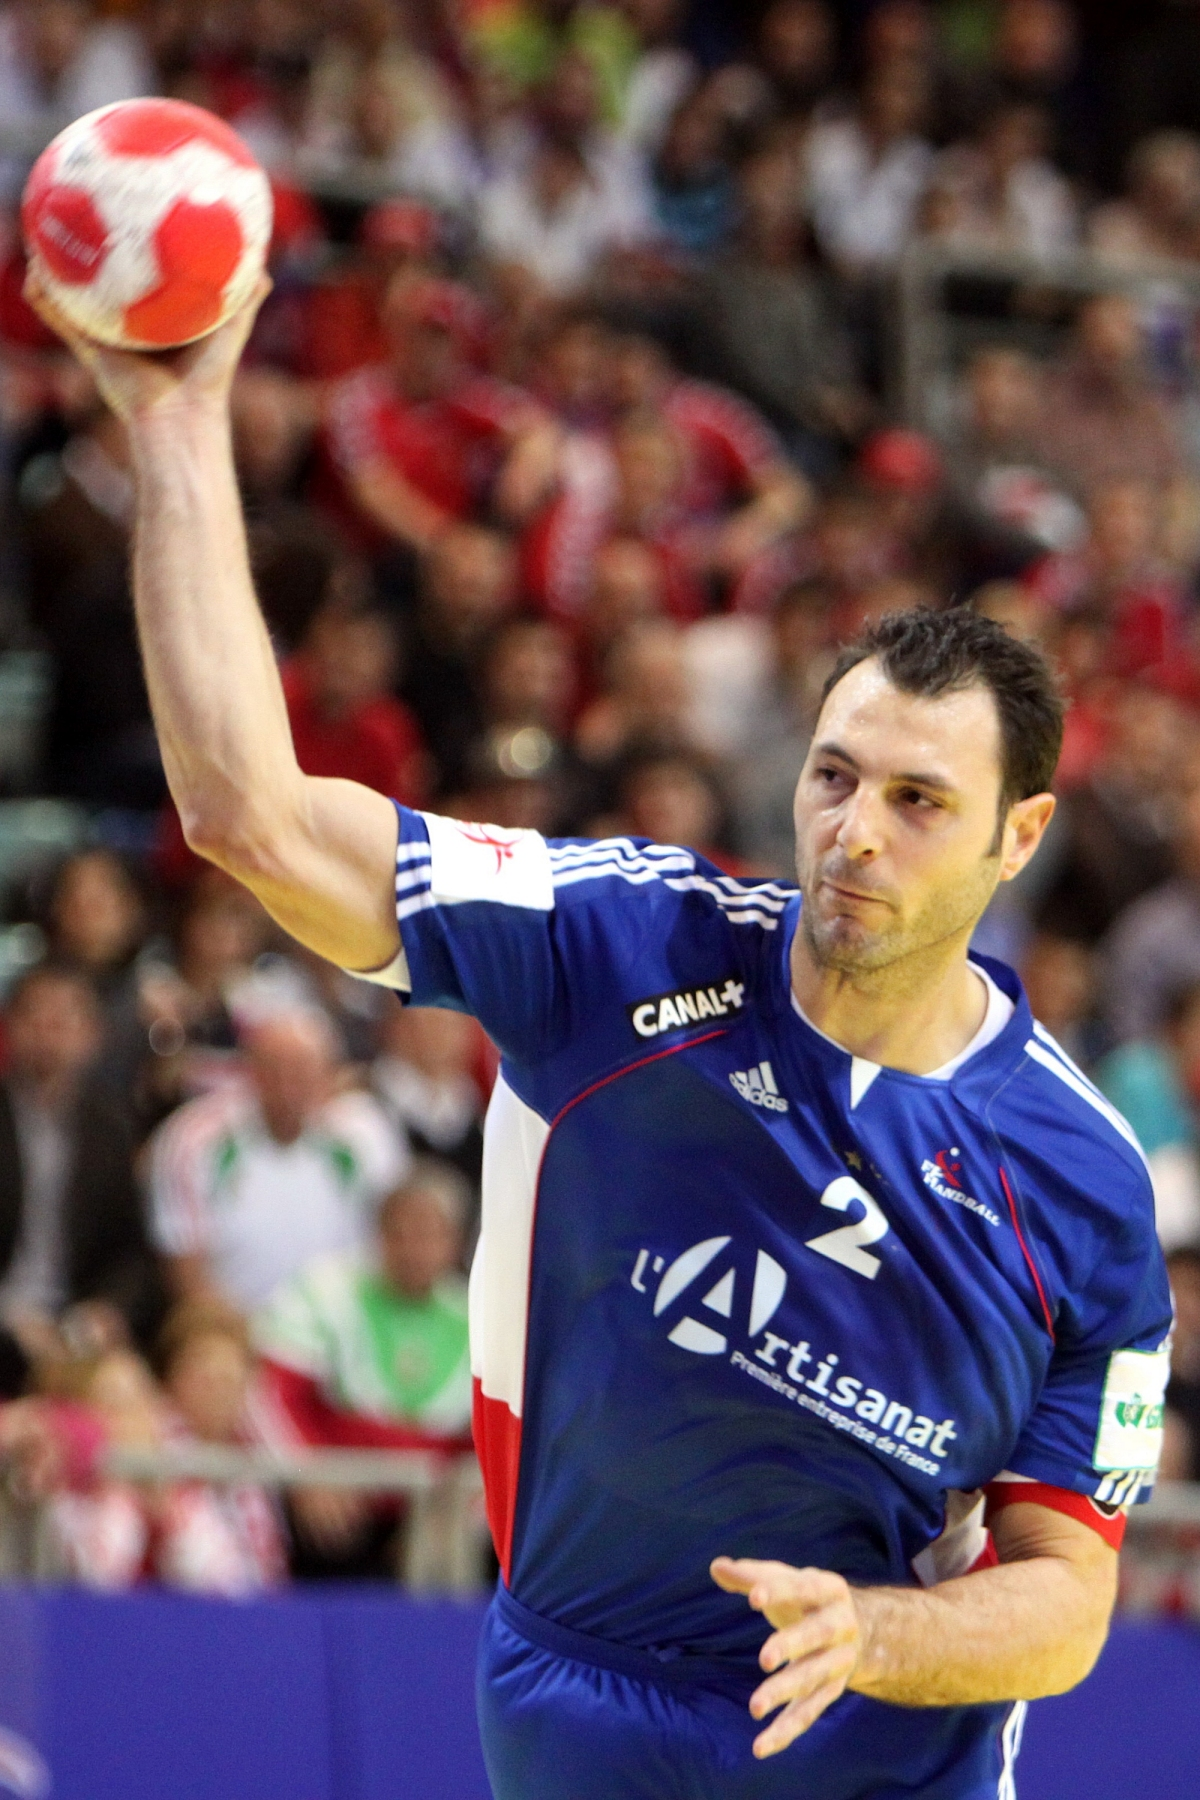 File Jerome Fernandez Bm Ciudad Real Handball Player Of France 4 Jpg Wikimedia Commons